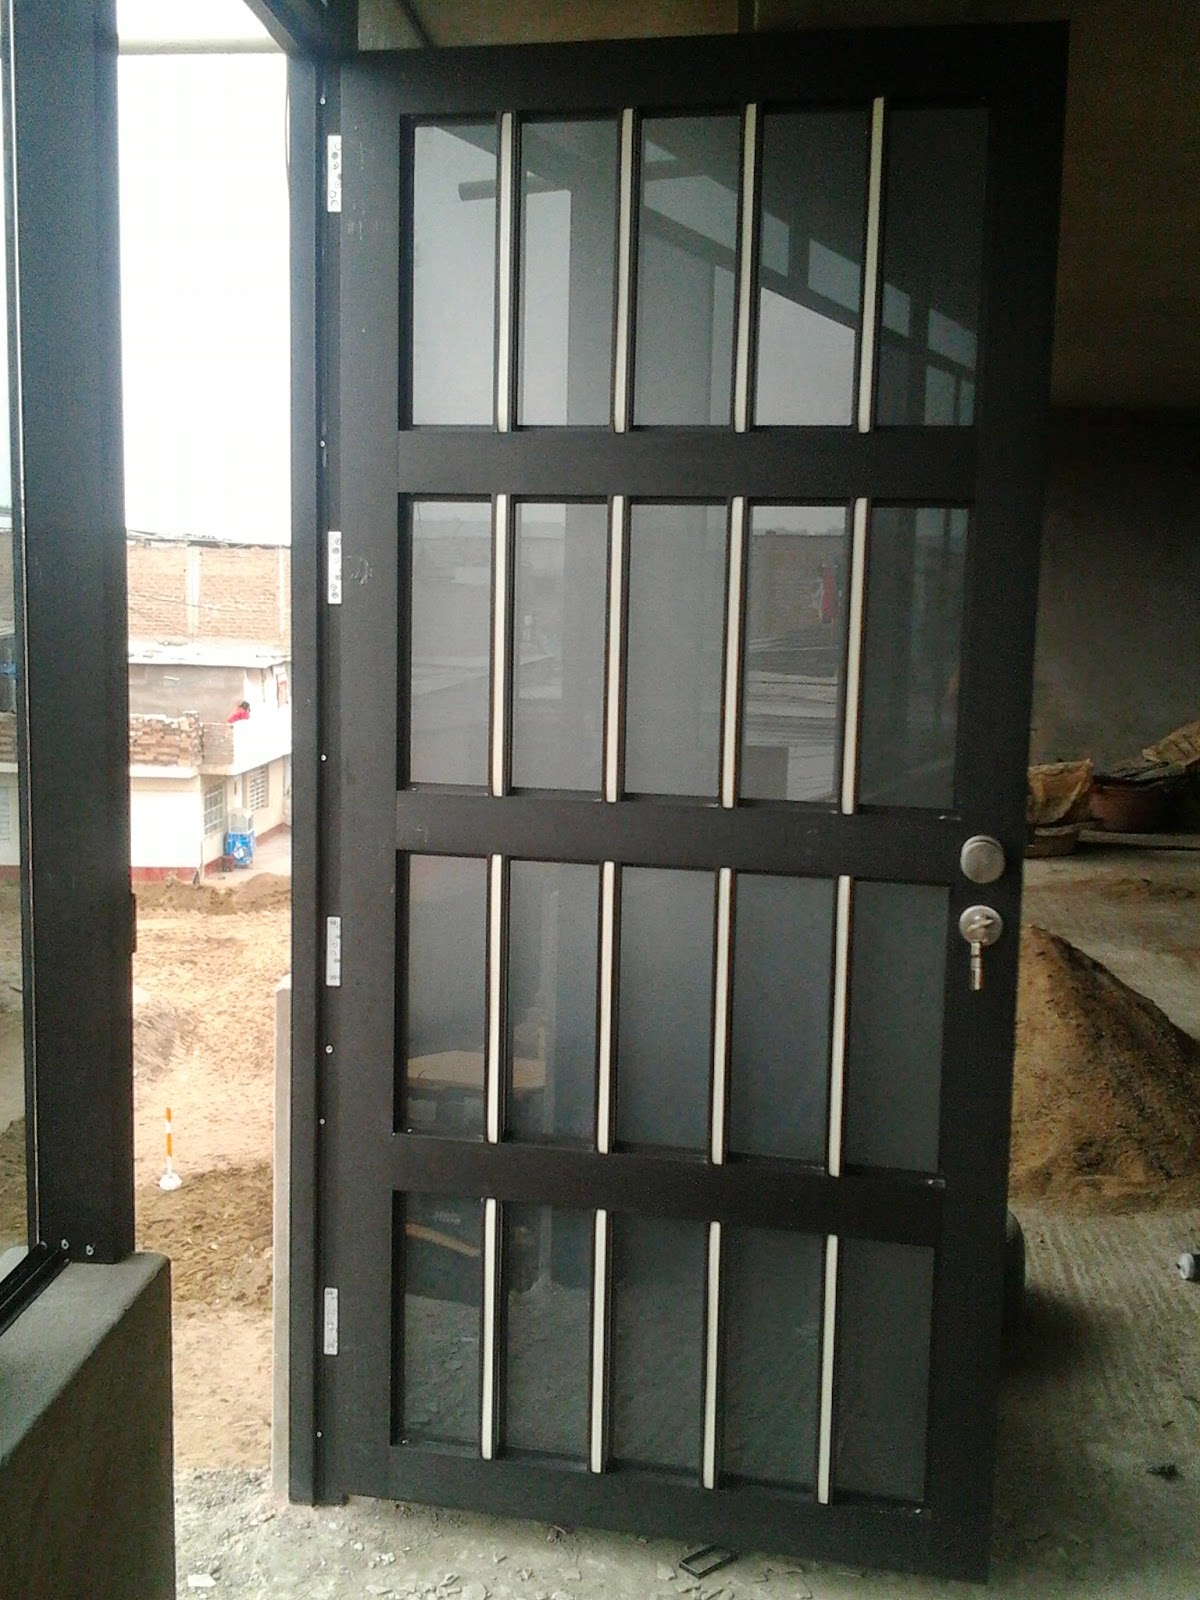 Puerta reja para exteriores mimaestro - Puertas de reja ...